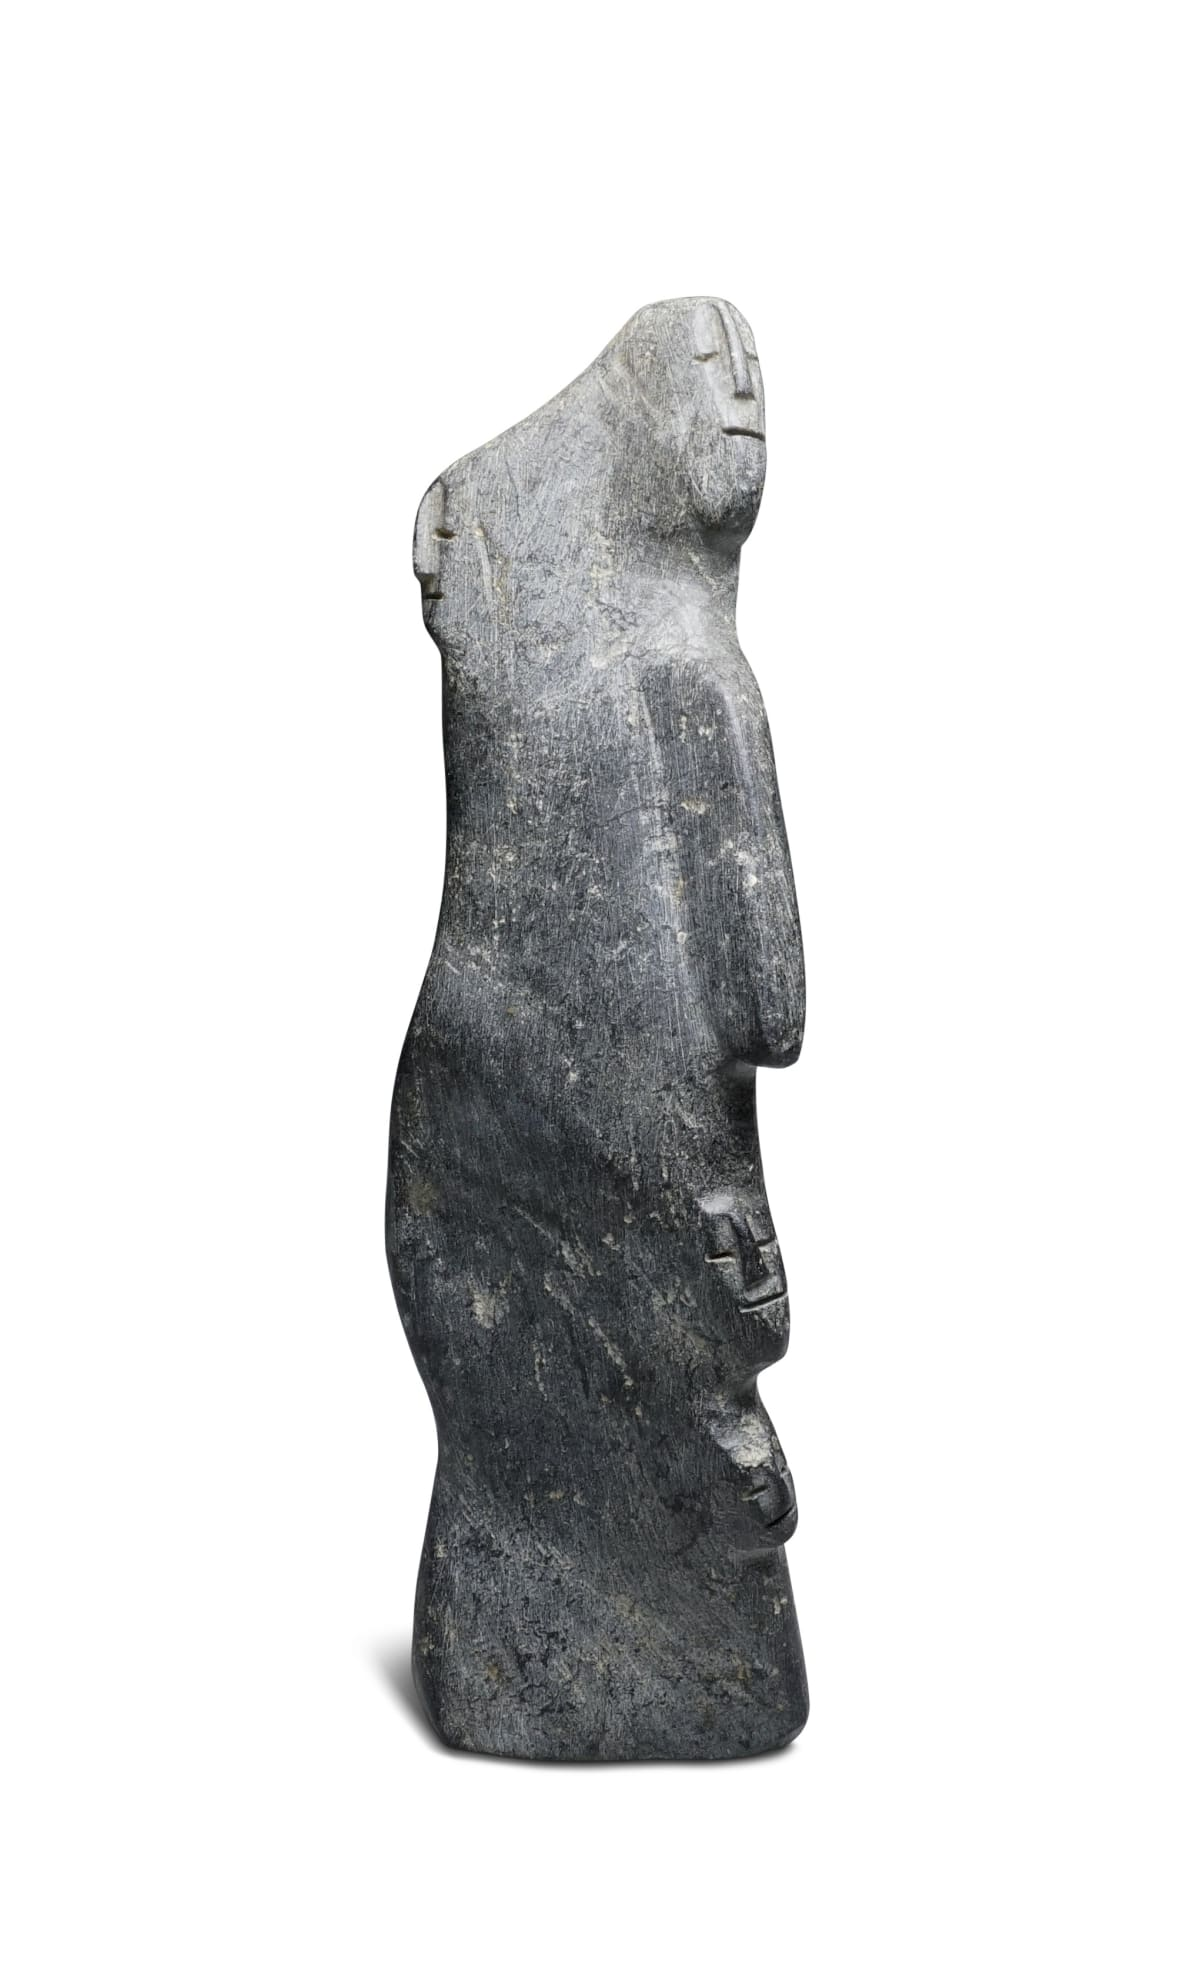 Lot 7A LUCY TASSEOR TUTSWEETOK (1934-2012) ARVIAT (ESKIMO POINT) Family, early 1980s stone, 8 1/4 x 2 1/2 x 3 3/4 in (21 x 6.3 x 9.5 cm) ESTIMATE: $1,000 - $1,500